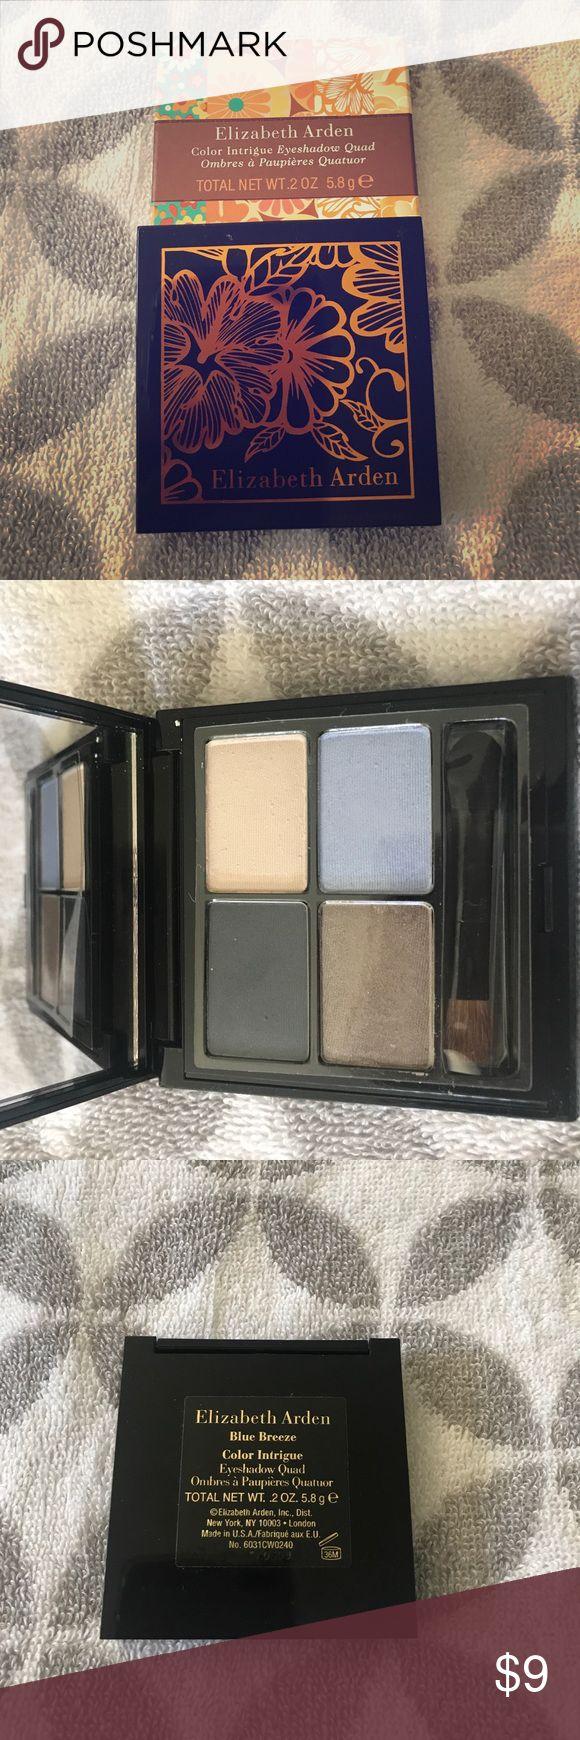 Elizabeth Arden color intrigue eyeshadow quad Brand new never been used !!!! Elizabeth Arden eyeshadow quad in blue breeze Elizabeth Arden Makeup Eyeshadow